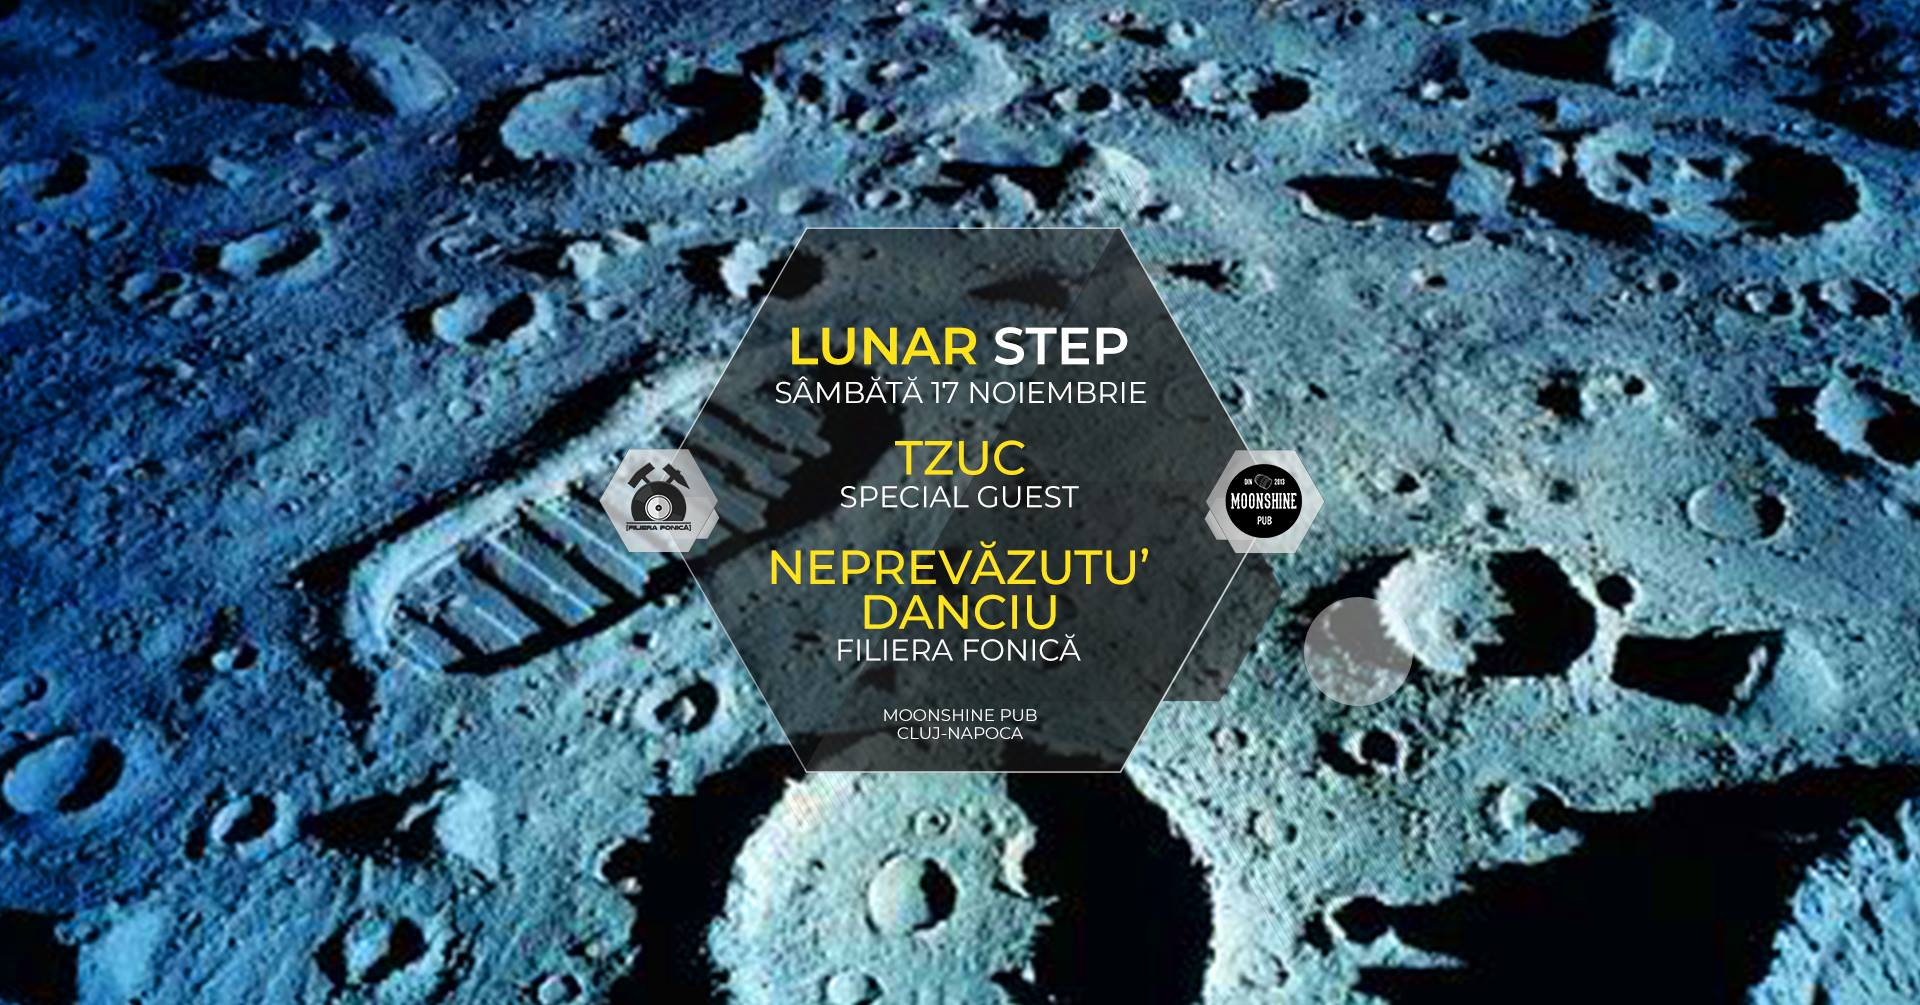 Lunar Step